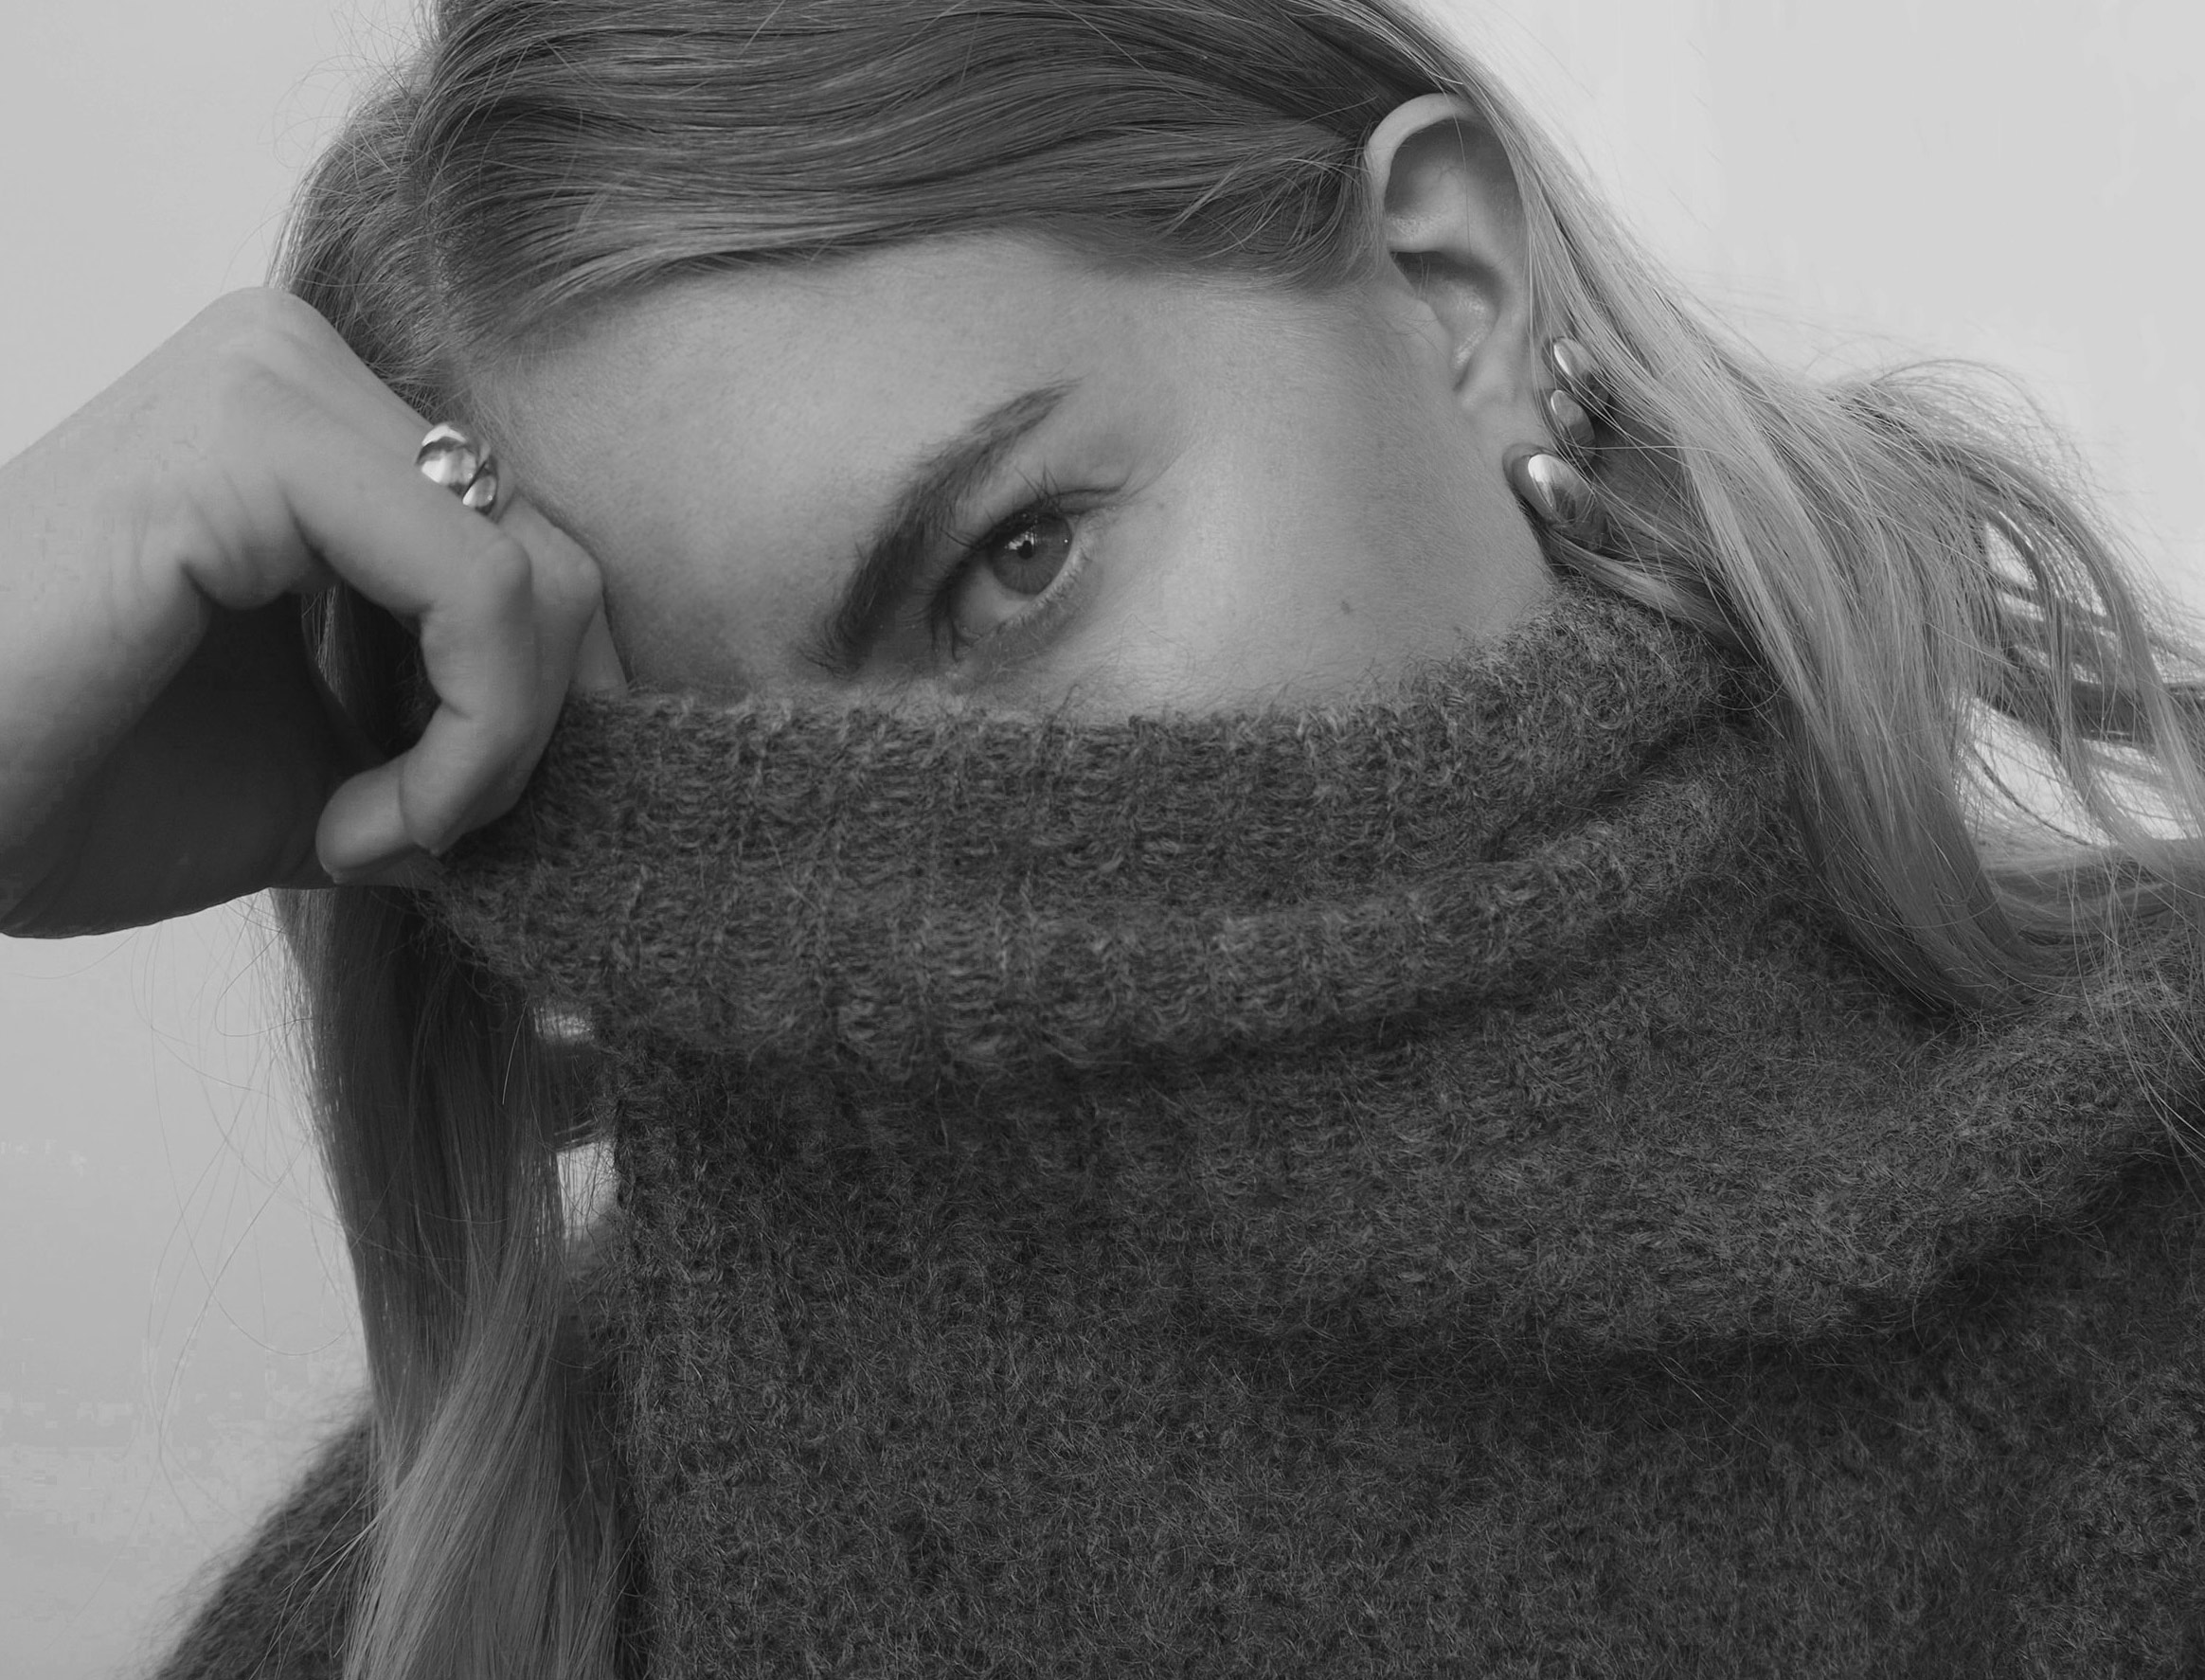 girl in turtleneck sweater